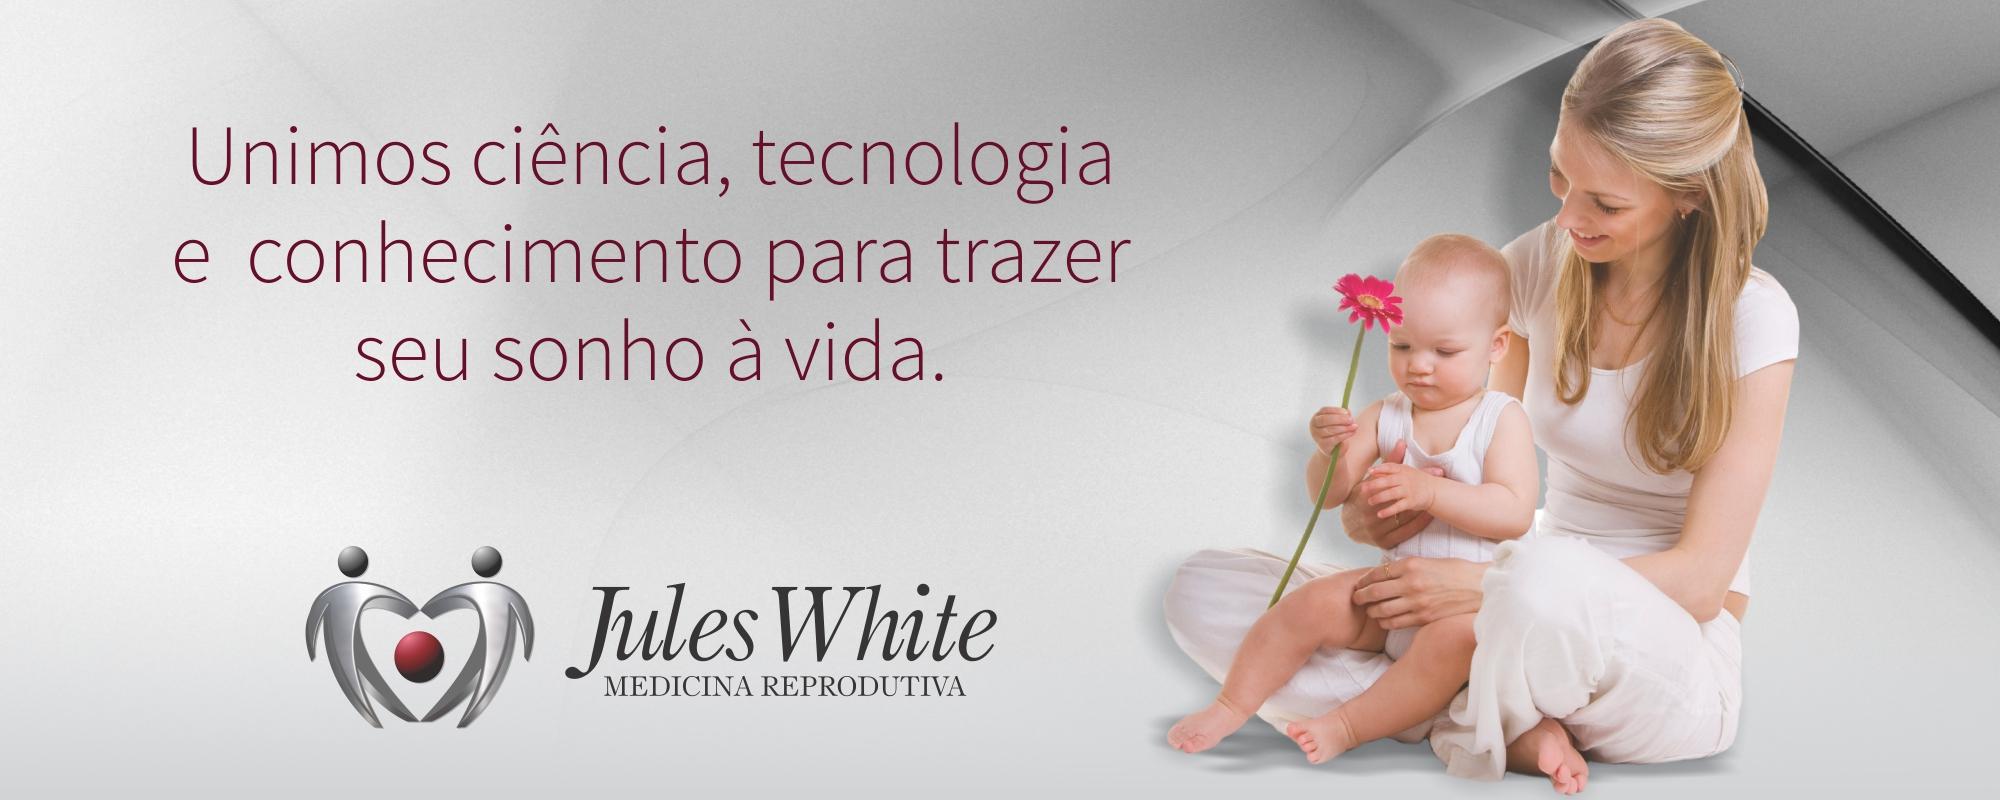 1_slide_Jules-White_medicina-reprodutiva_Infertilidade1